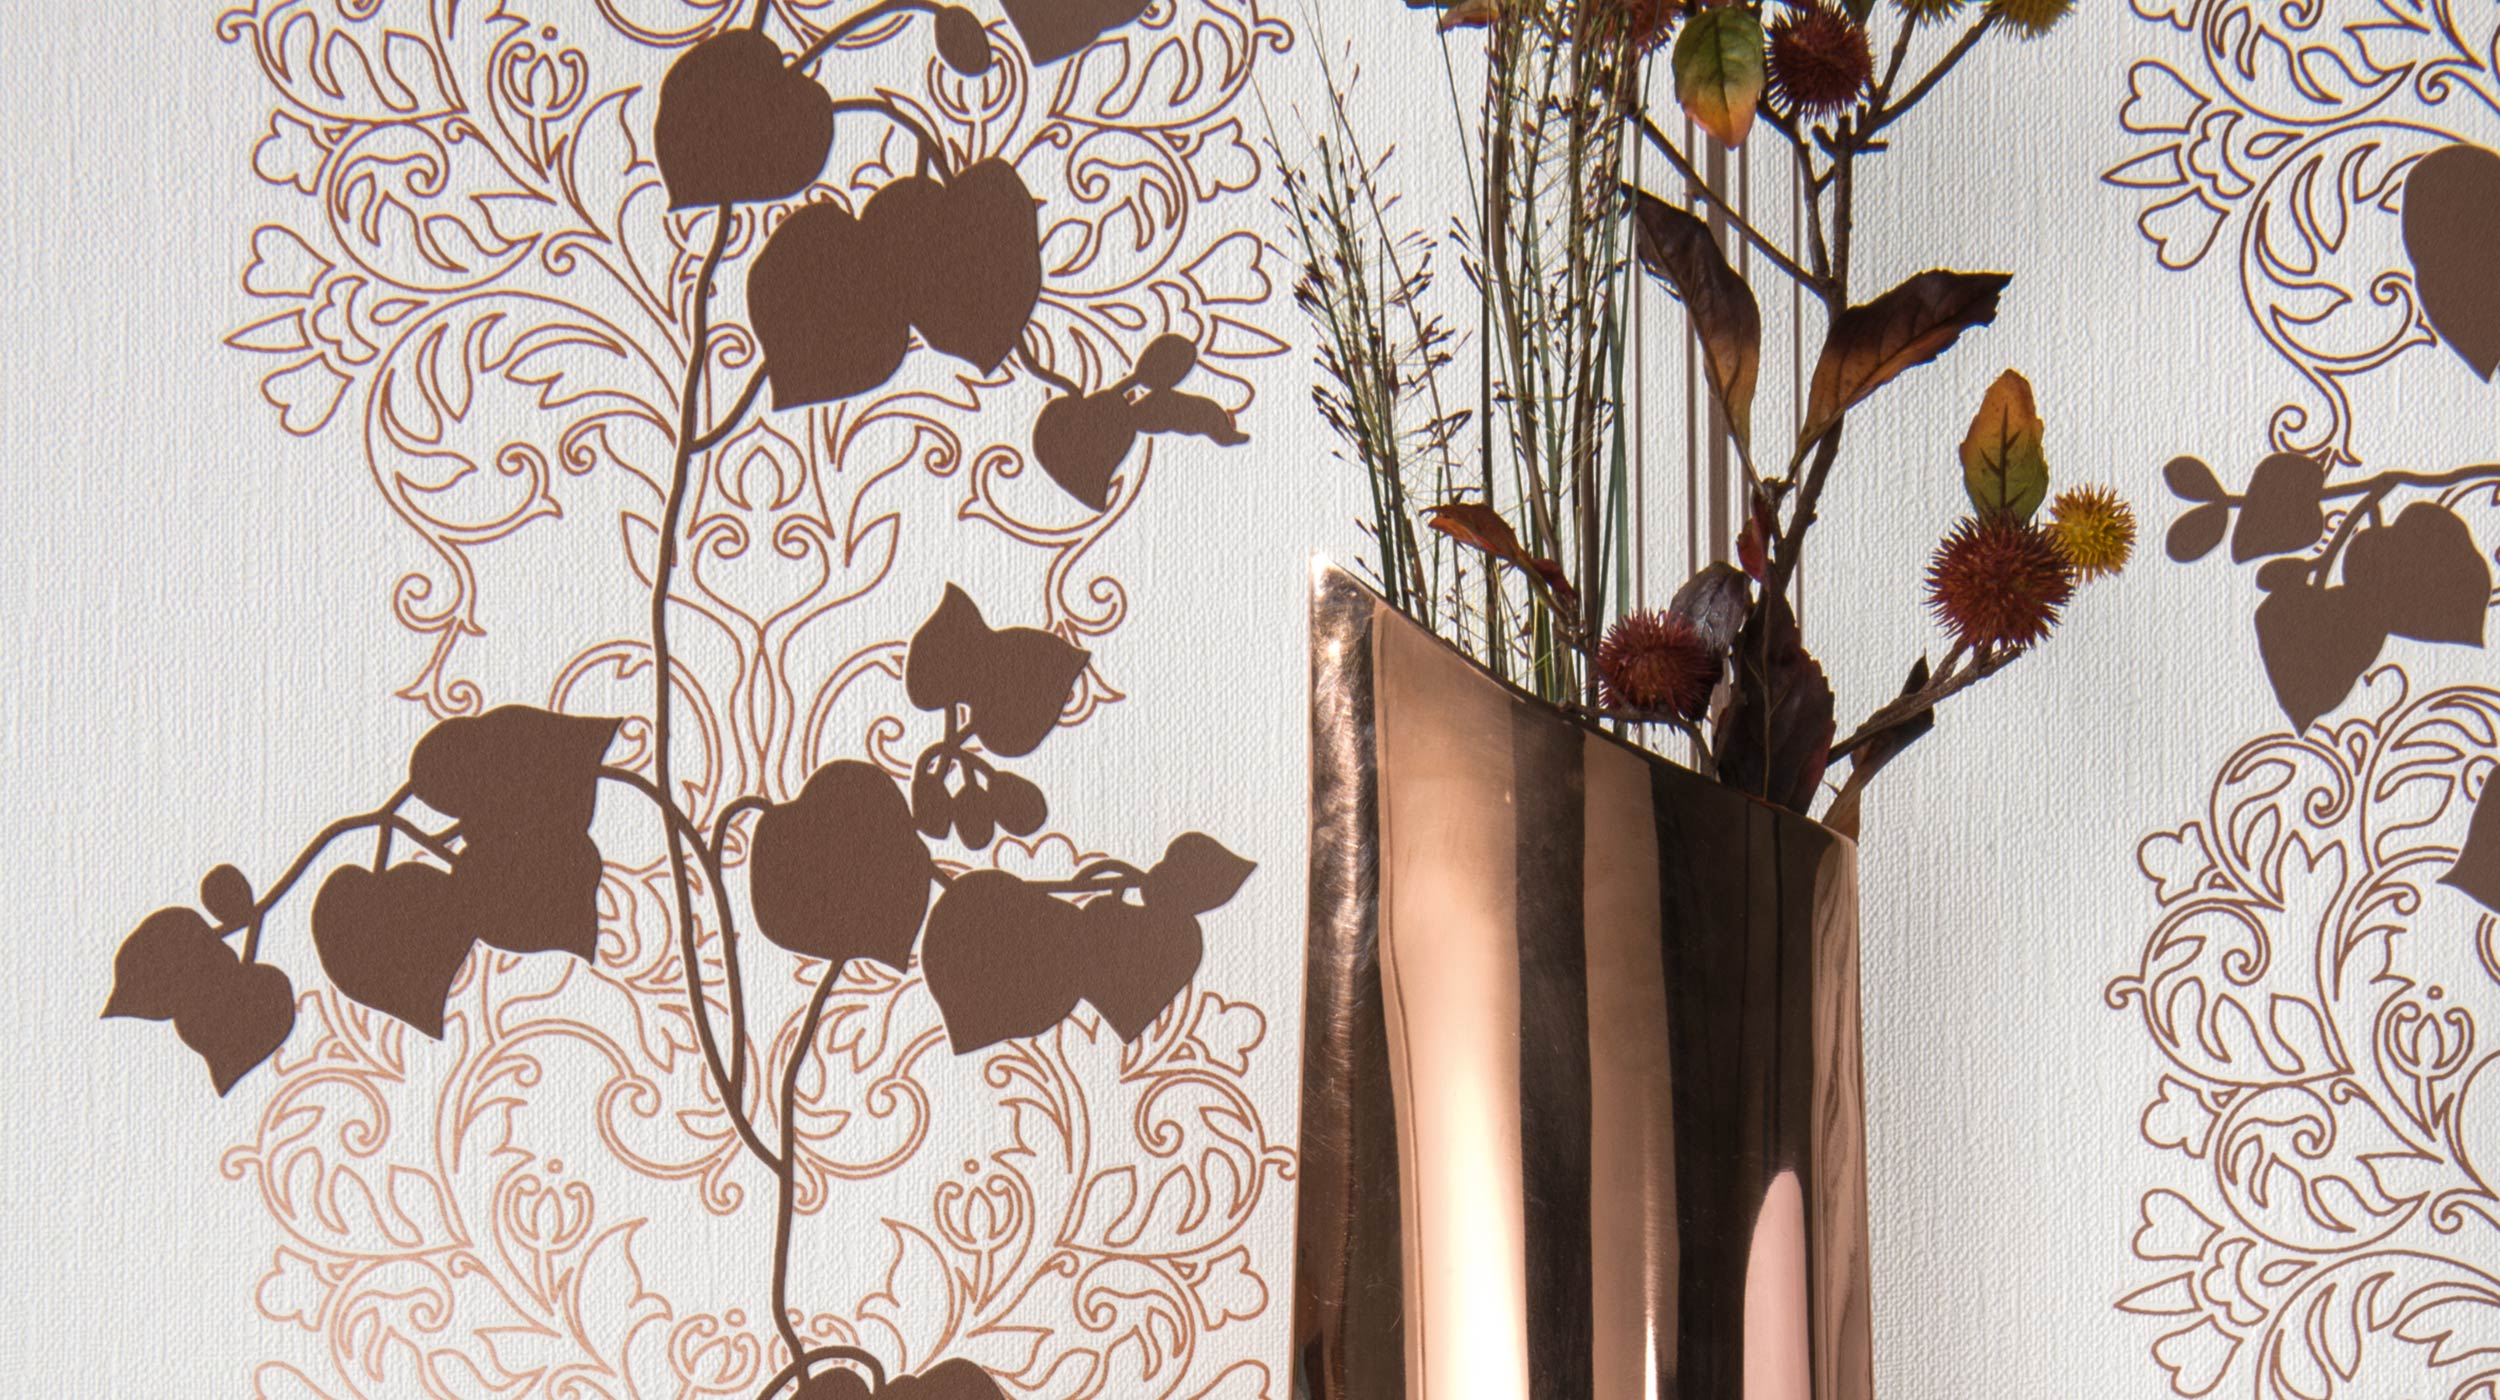 Pure Elegance Tapeten Vlies 2014 1.jpg   Erismann & Cie. GmbH